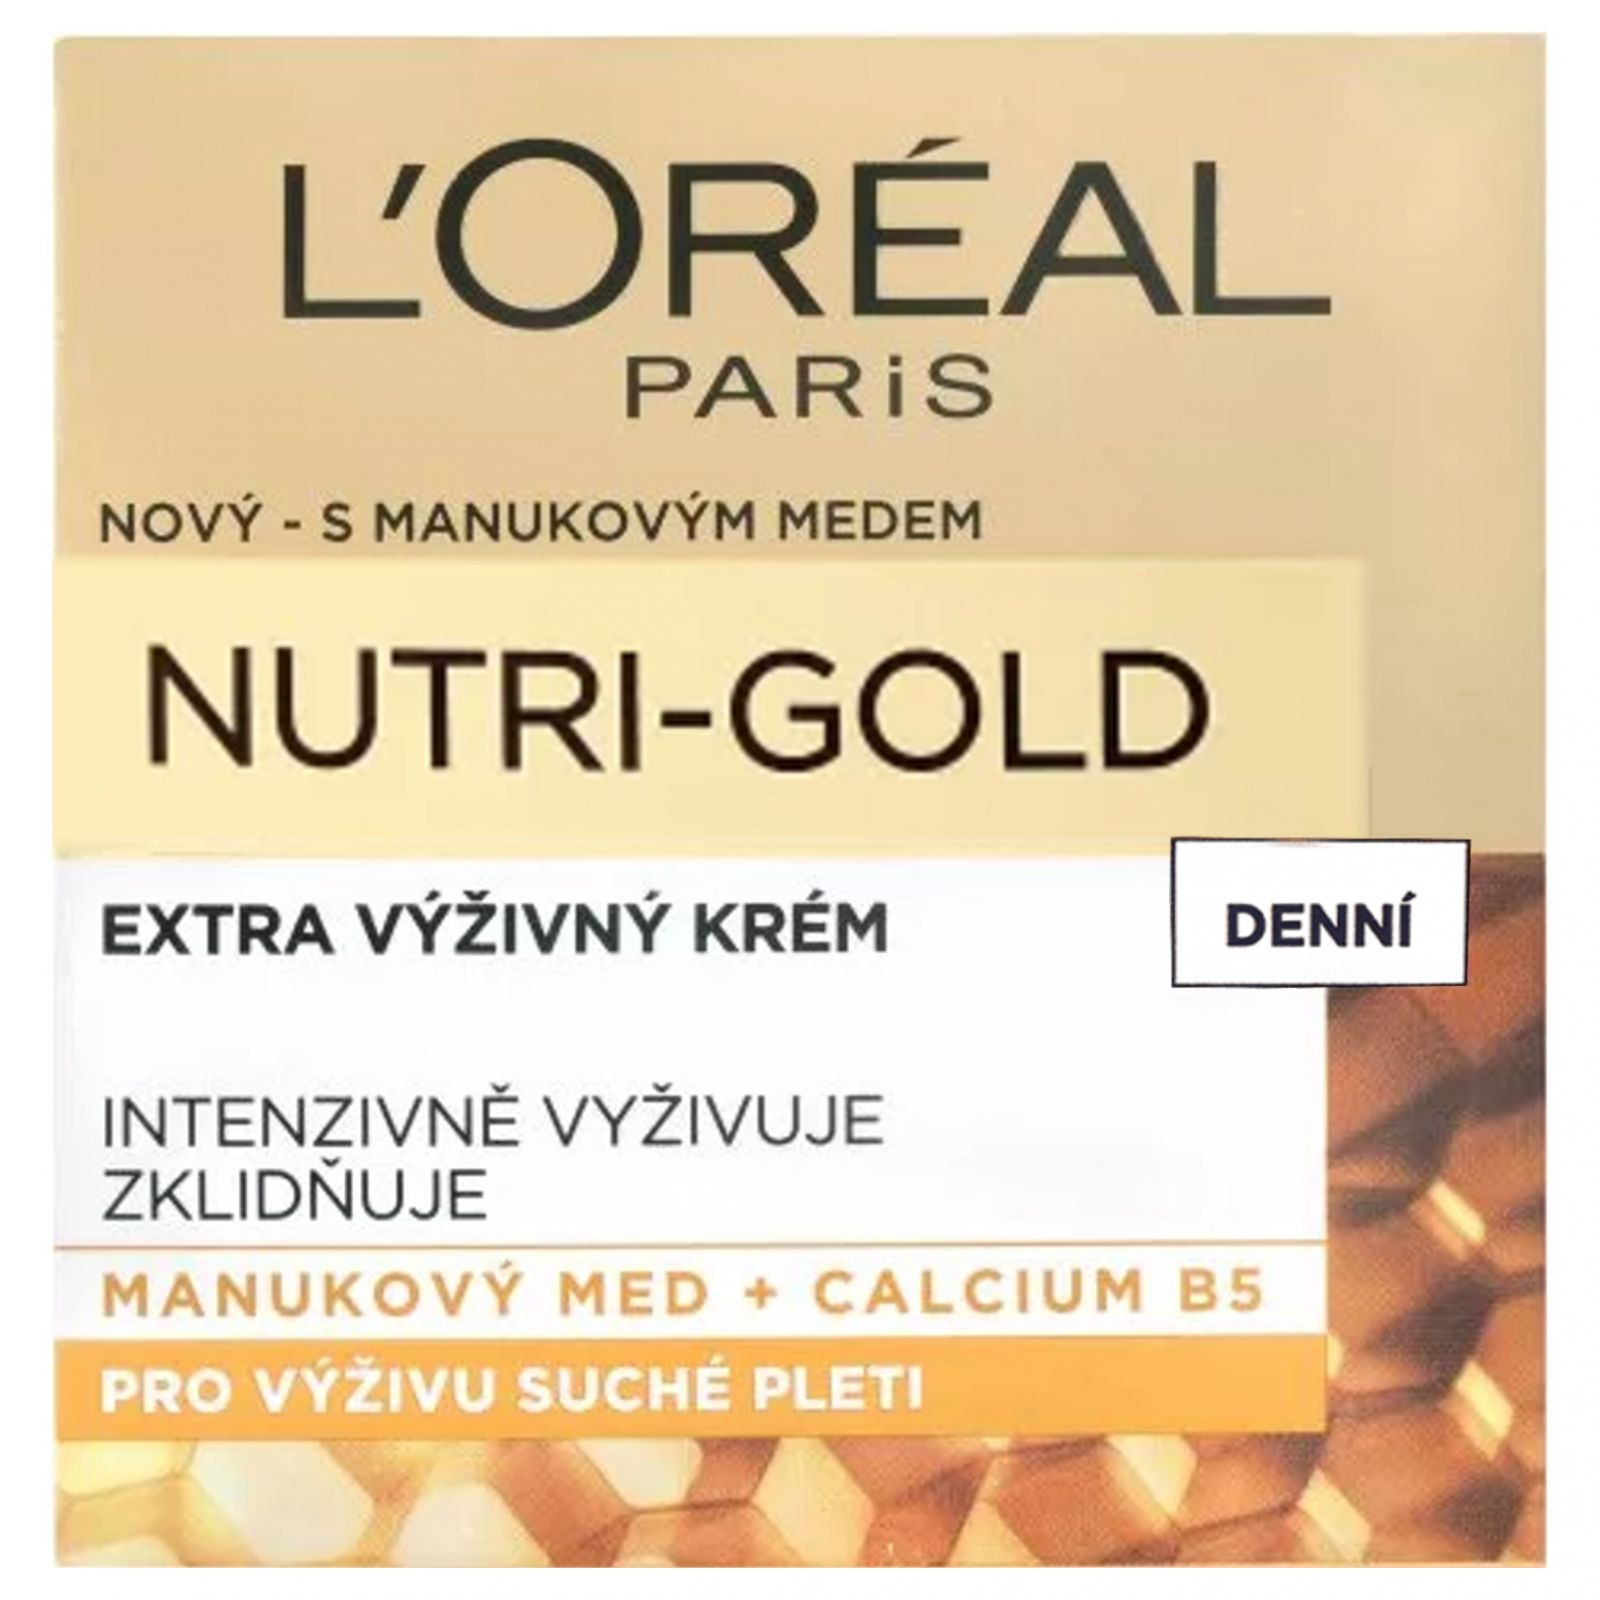 L'Oréal Paris Nutri─Gold Extra výživný denní krém 50 ml